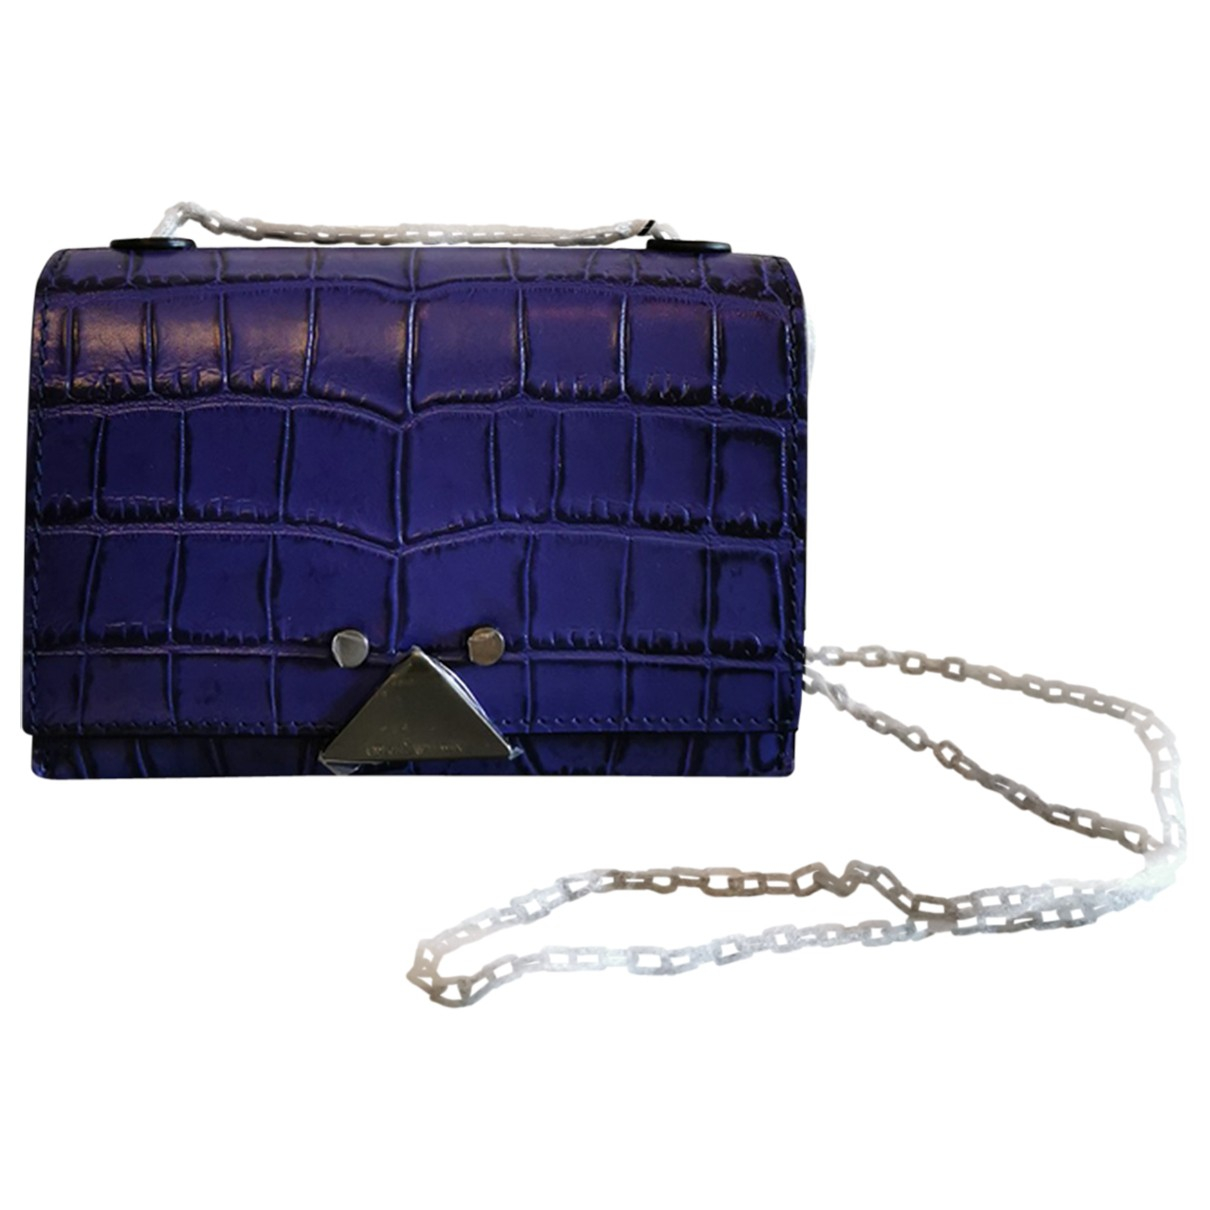 Emporio Armani \N Handtasche in  Lila Leder